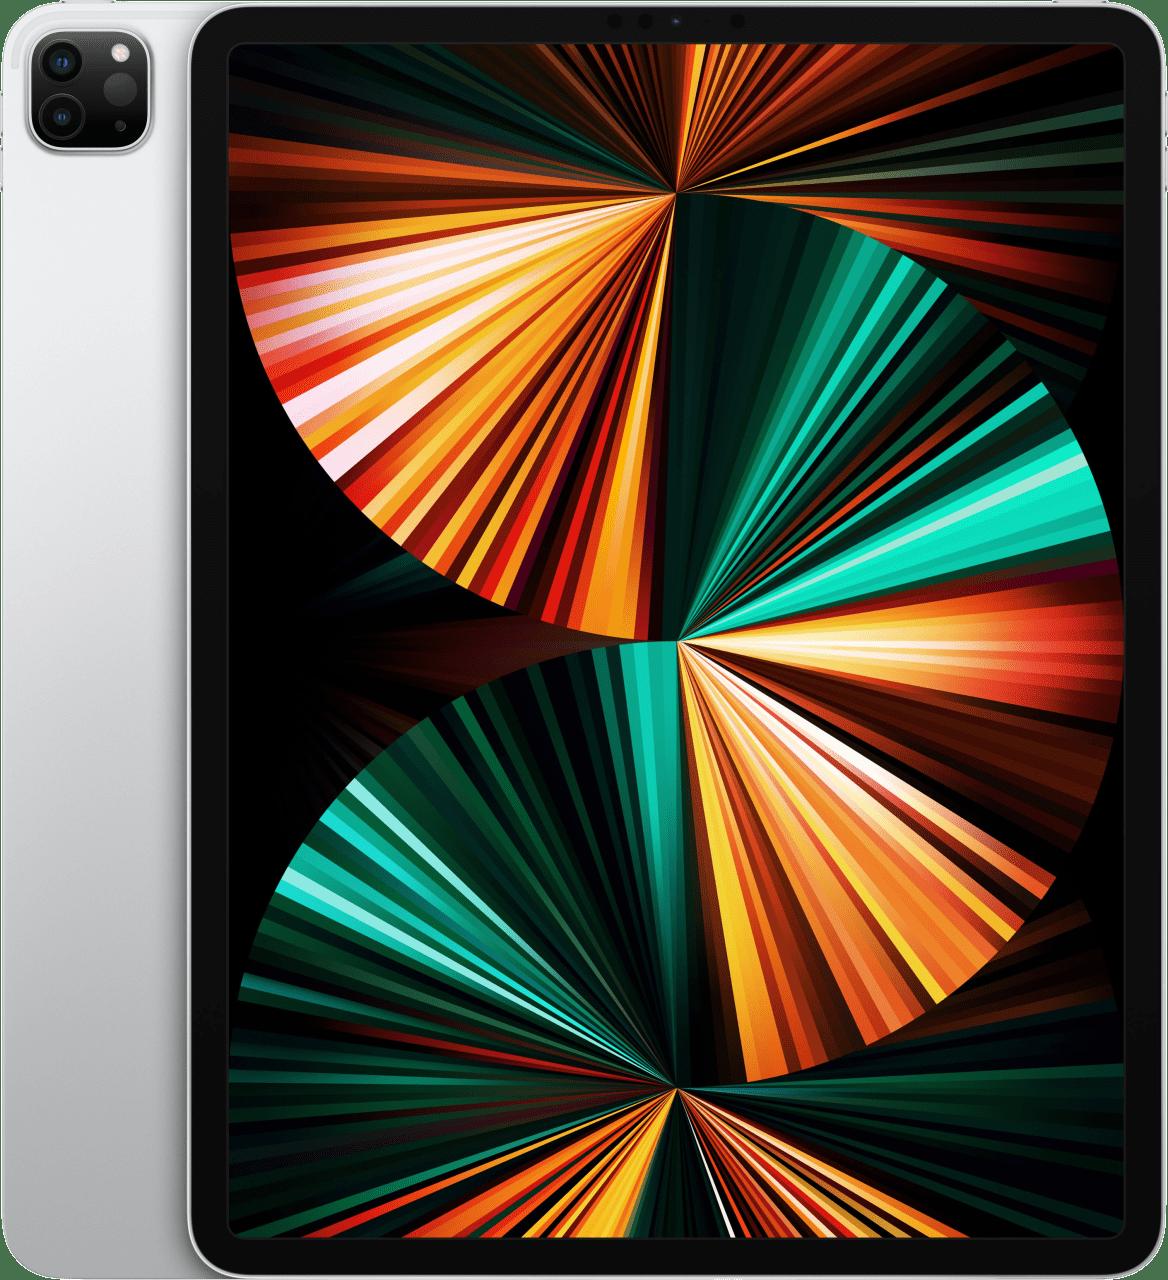 "Silver Apple 12.9"" iPad Pro (2021) - Wi-Fi + Cellular - iOS 14 - 128GB.1"